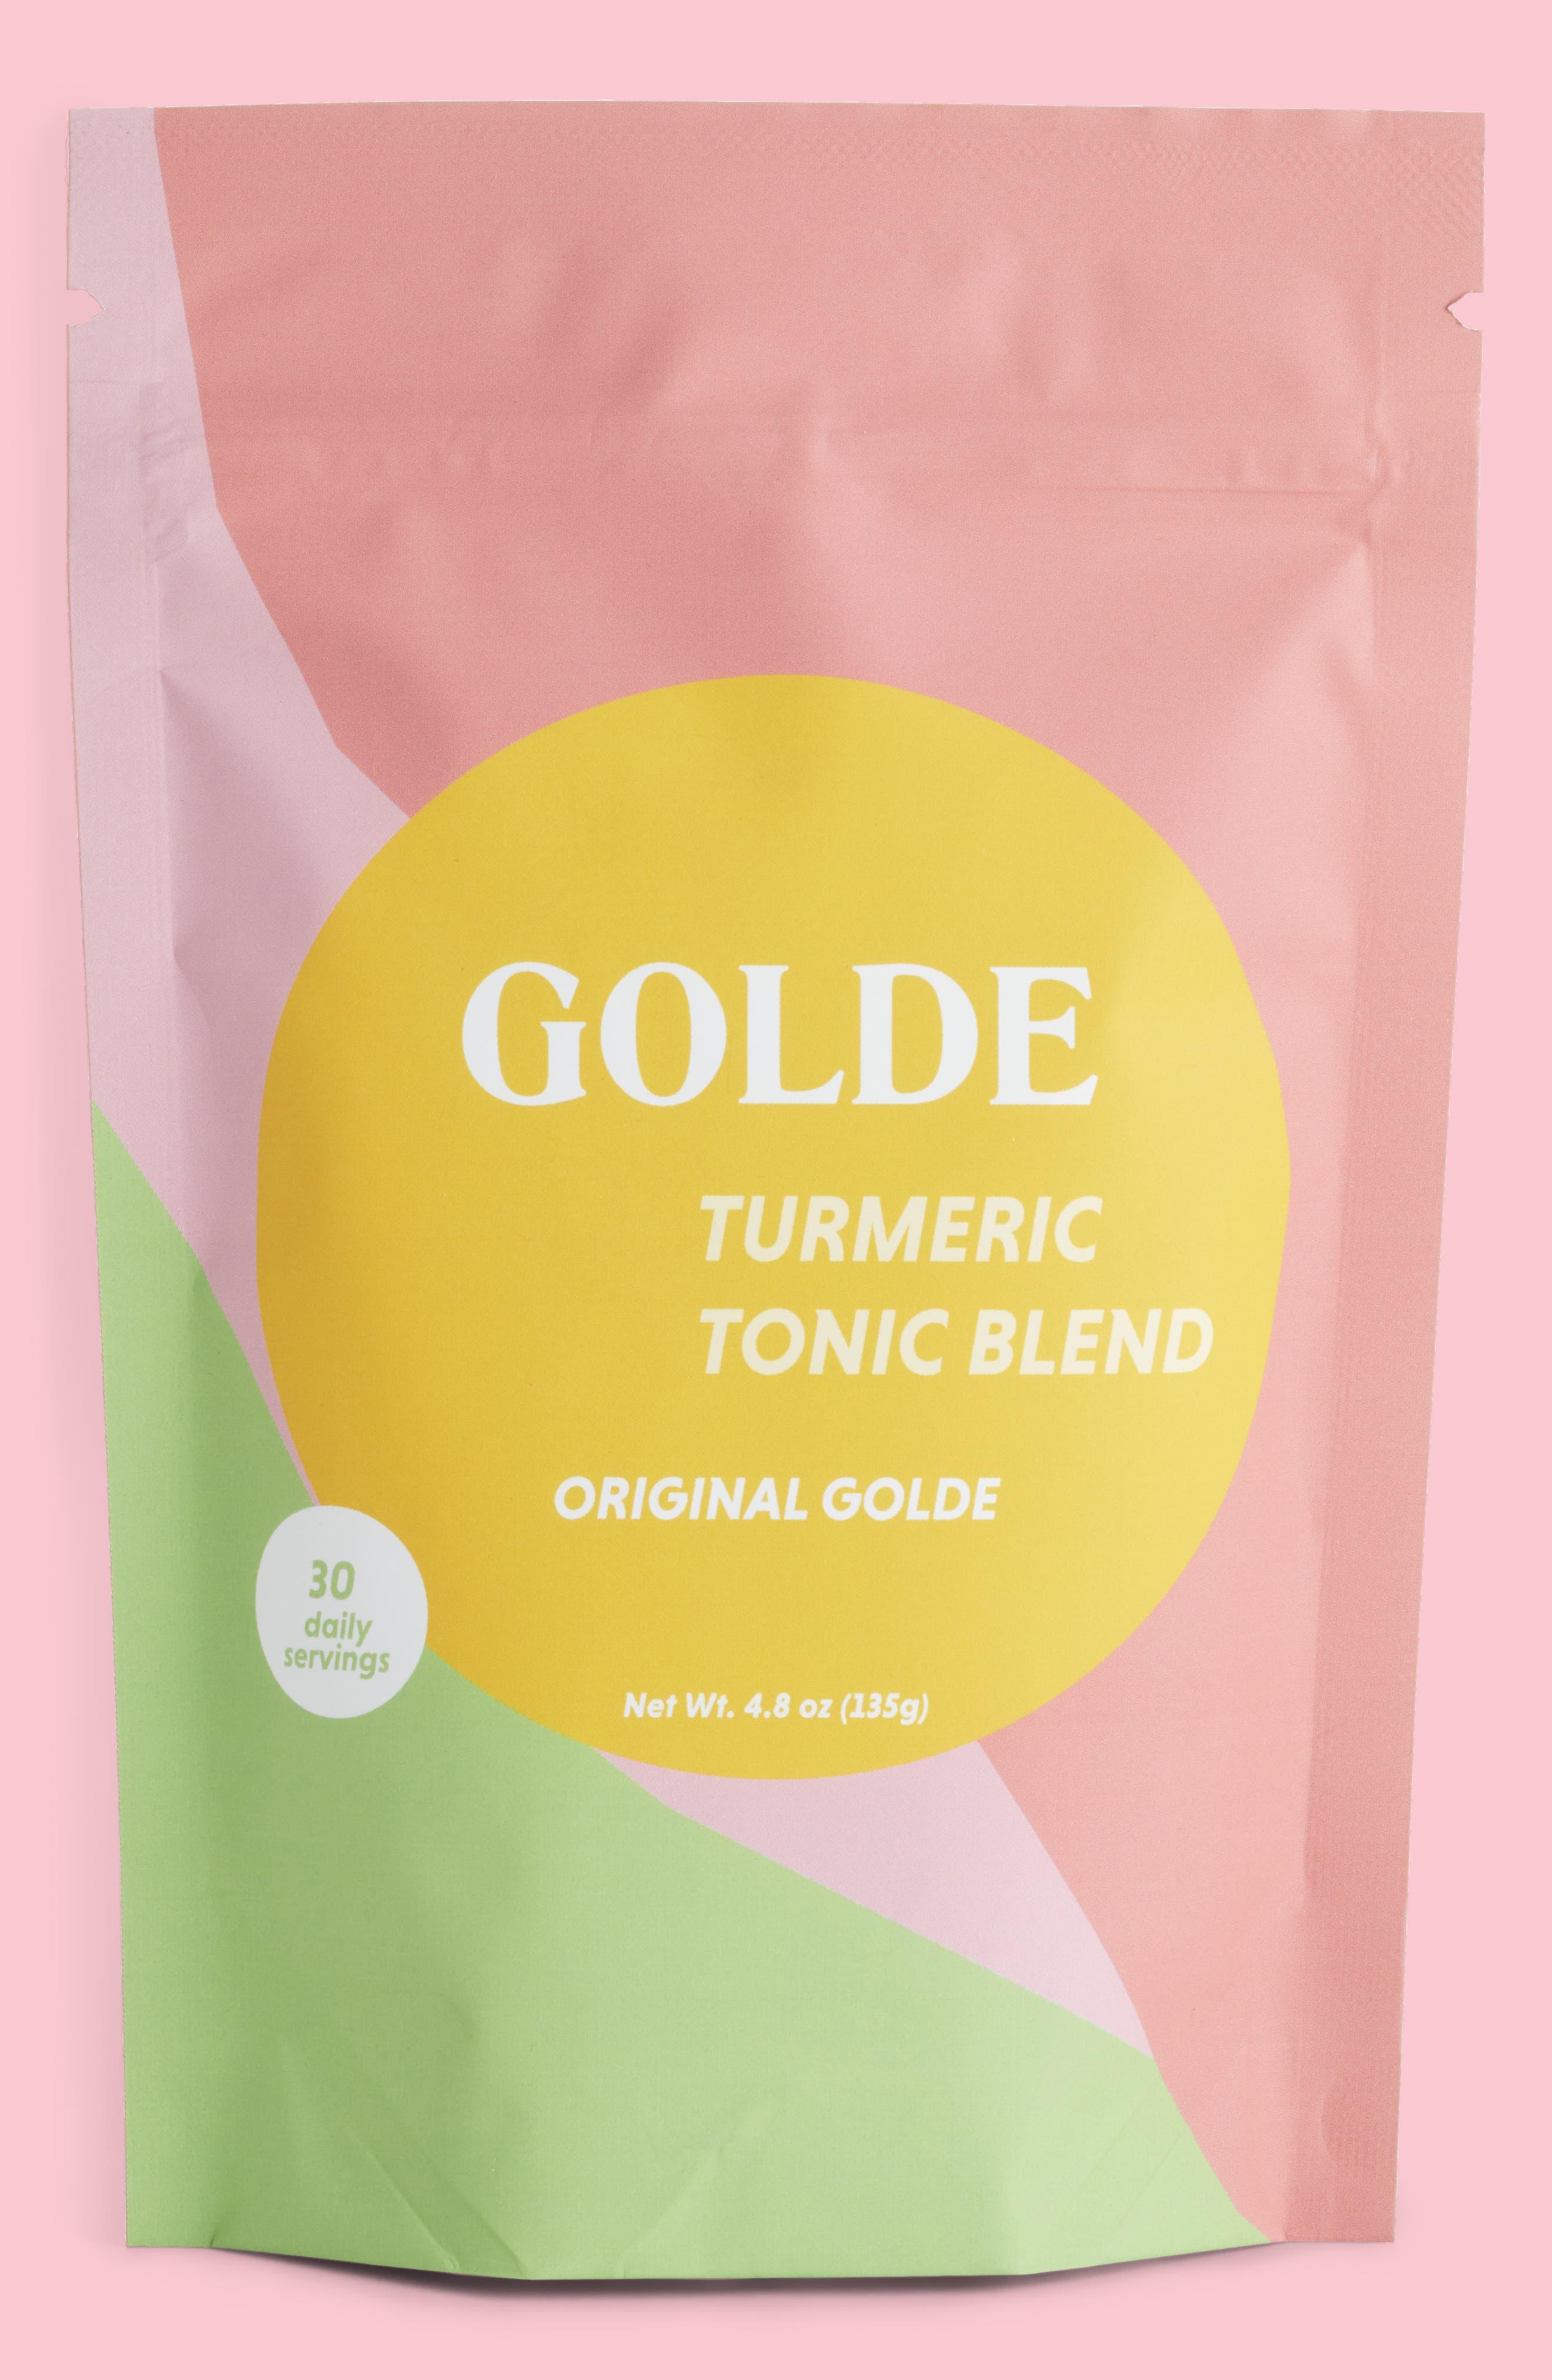 Golde Original Golde Turmeric Tonic Blend,                             Main thumbnail 1, color,                             None